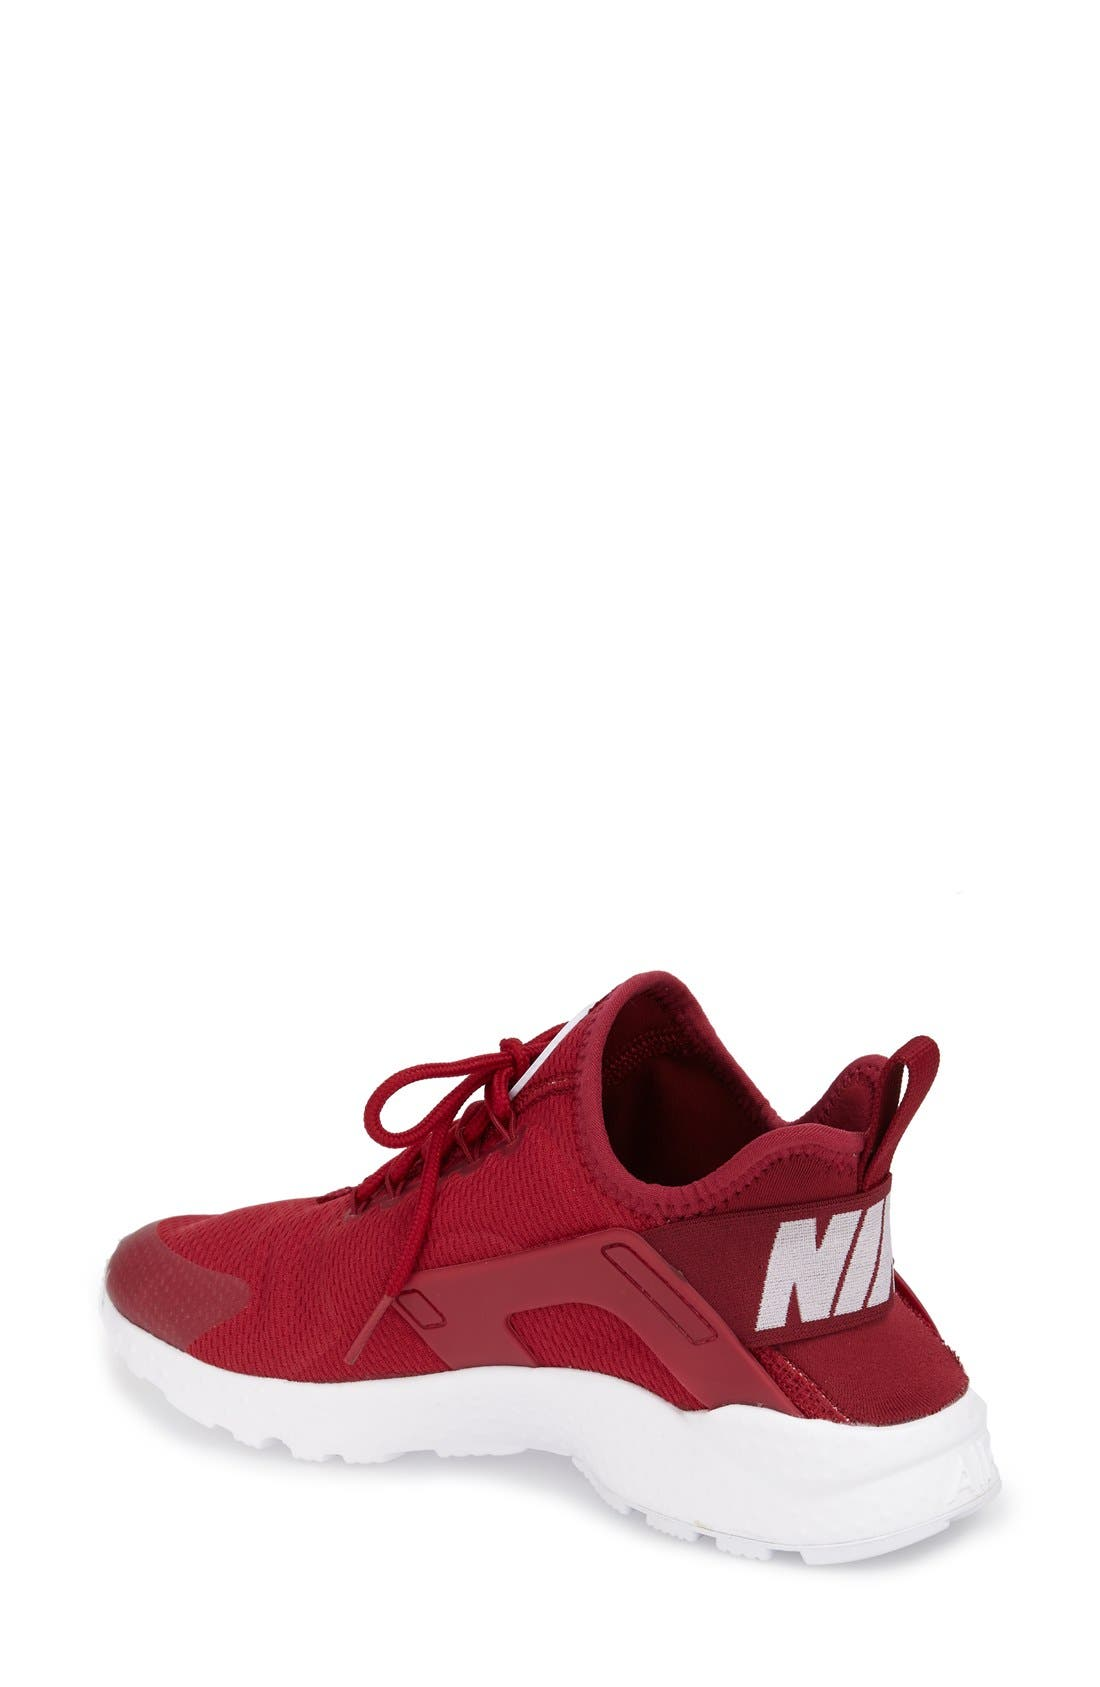 Air Huarache Sneaker,                             Alternate thumbnail 74, color,